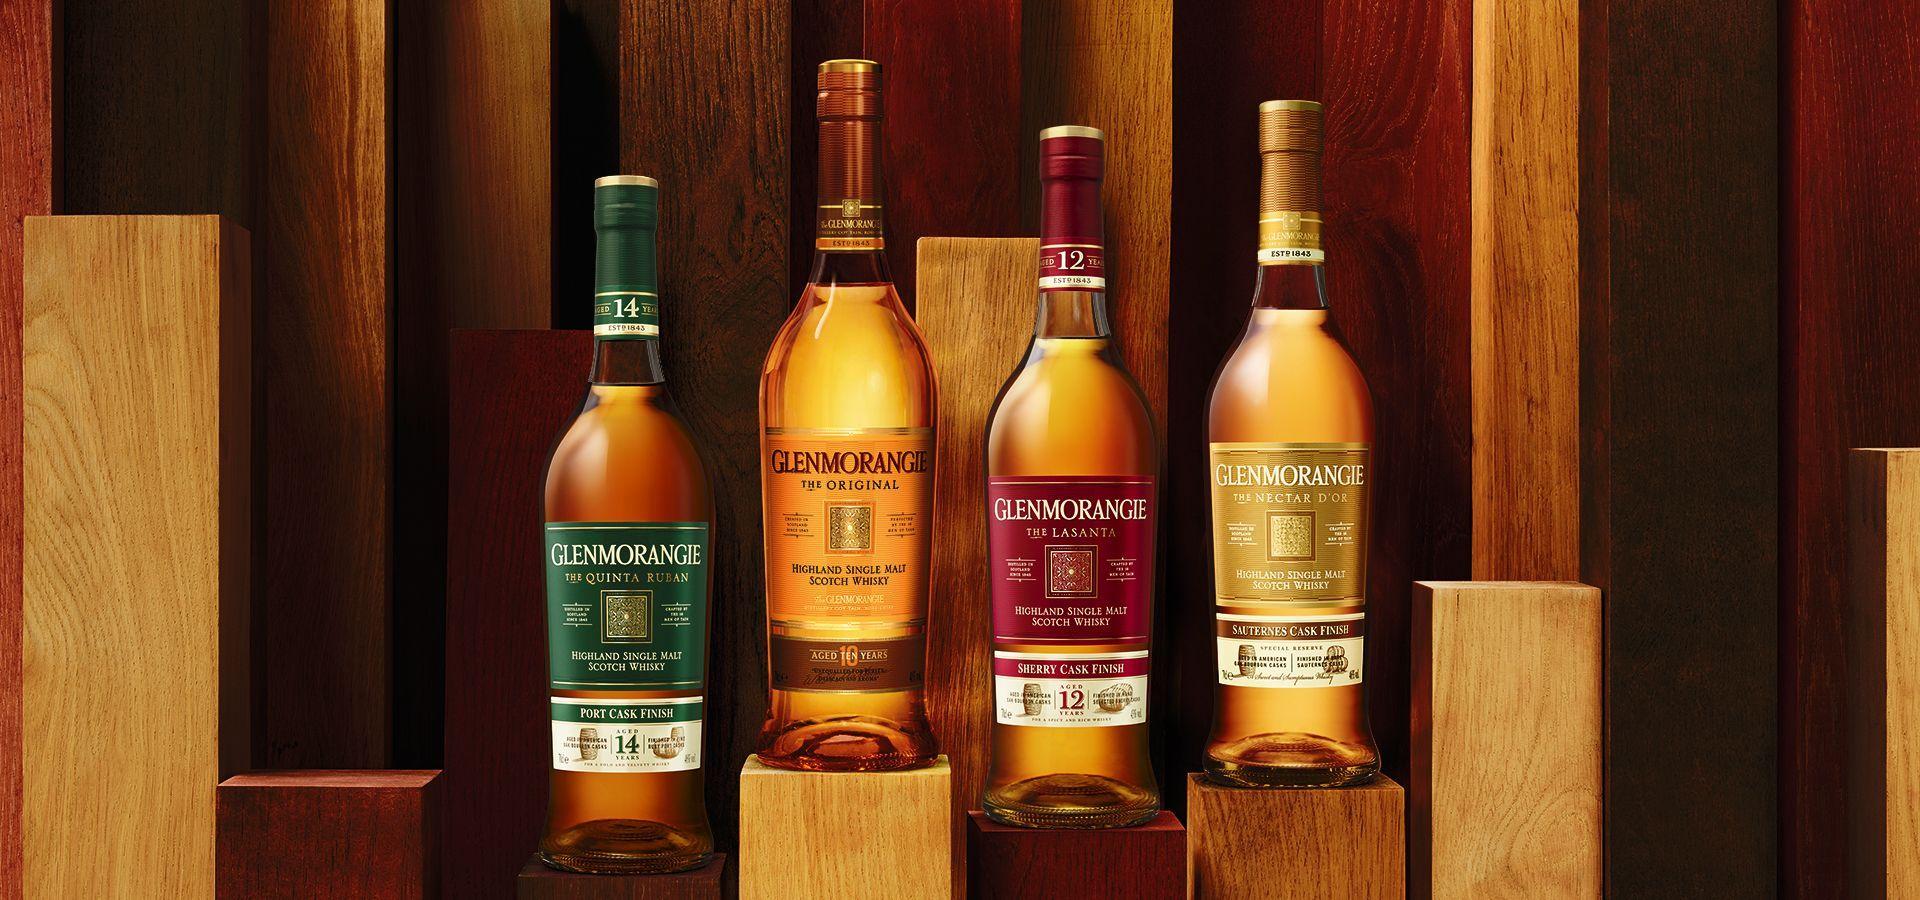 Best Whisky: Ardbeg and Glenmorangie Break Records At International Whisky Competition